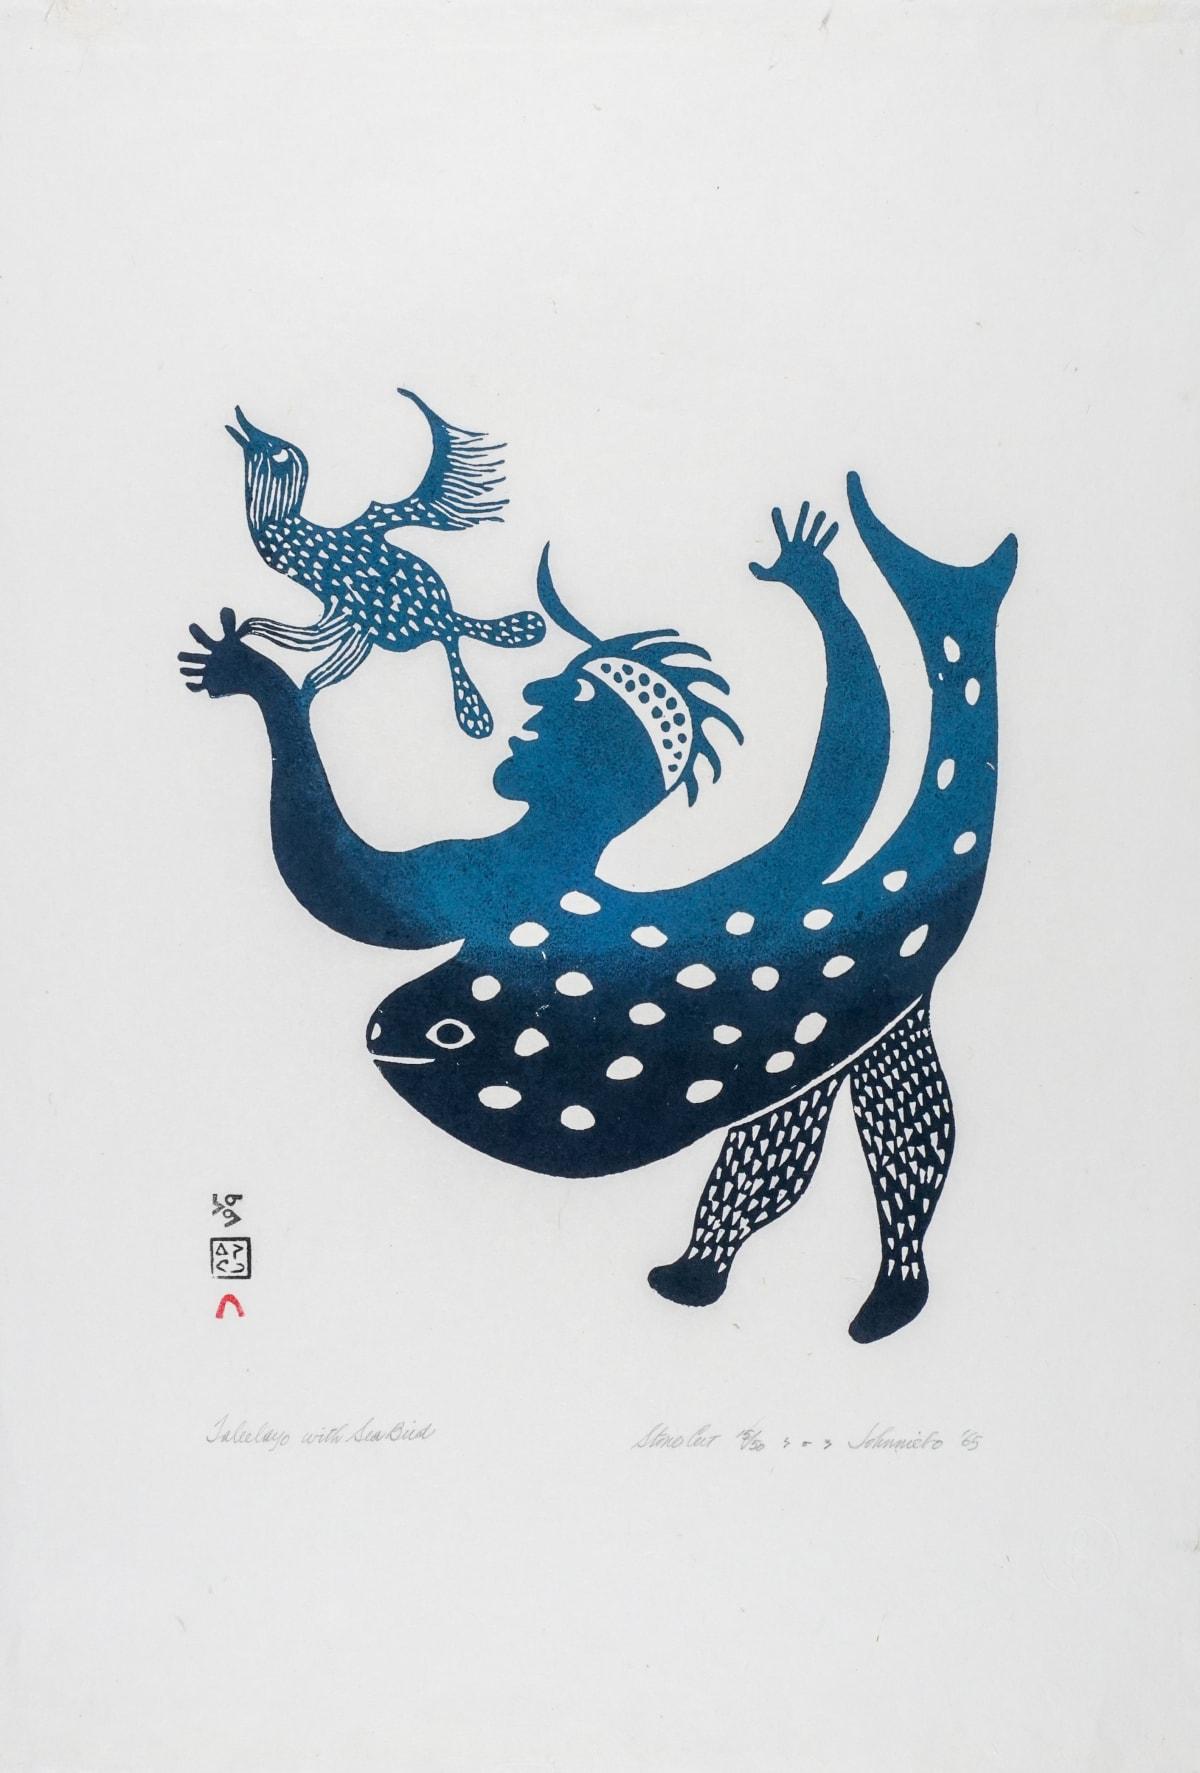 LOT 18 JOHNNIEBO ASHEVAK (1923-1972) KINNGAIT (CAPE DORSET) Taleelayo with Sea Bird, 1965 stonecut, 25 x 17 in (63.5 x 43.2 cm) ESTIMATE: $600 — $900